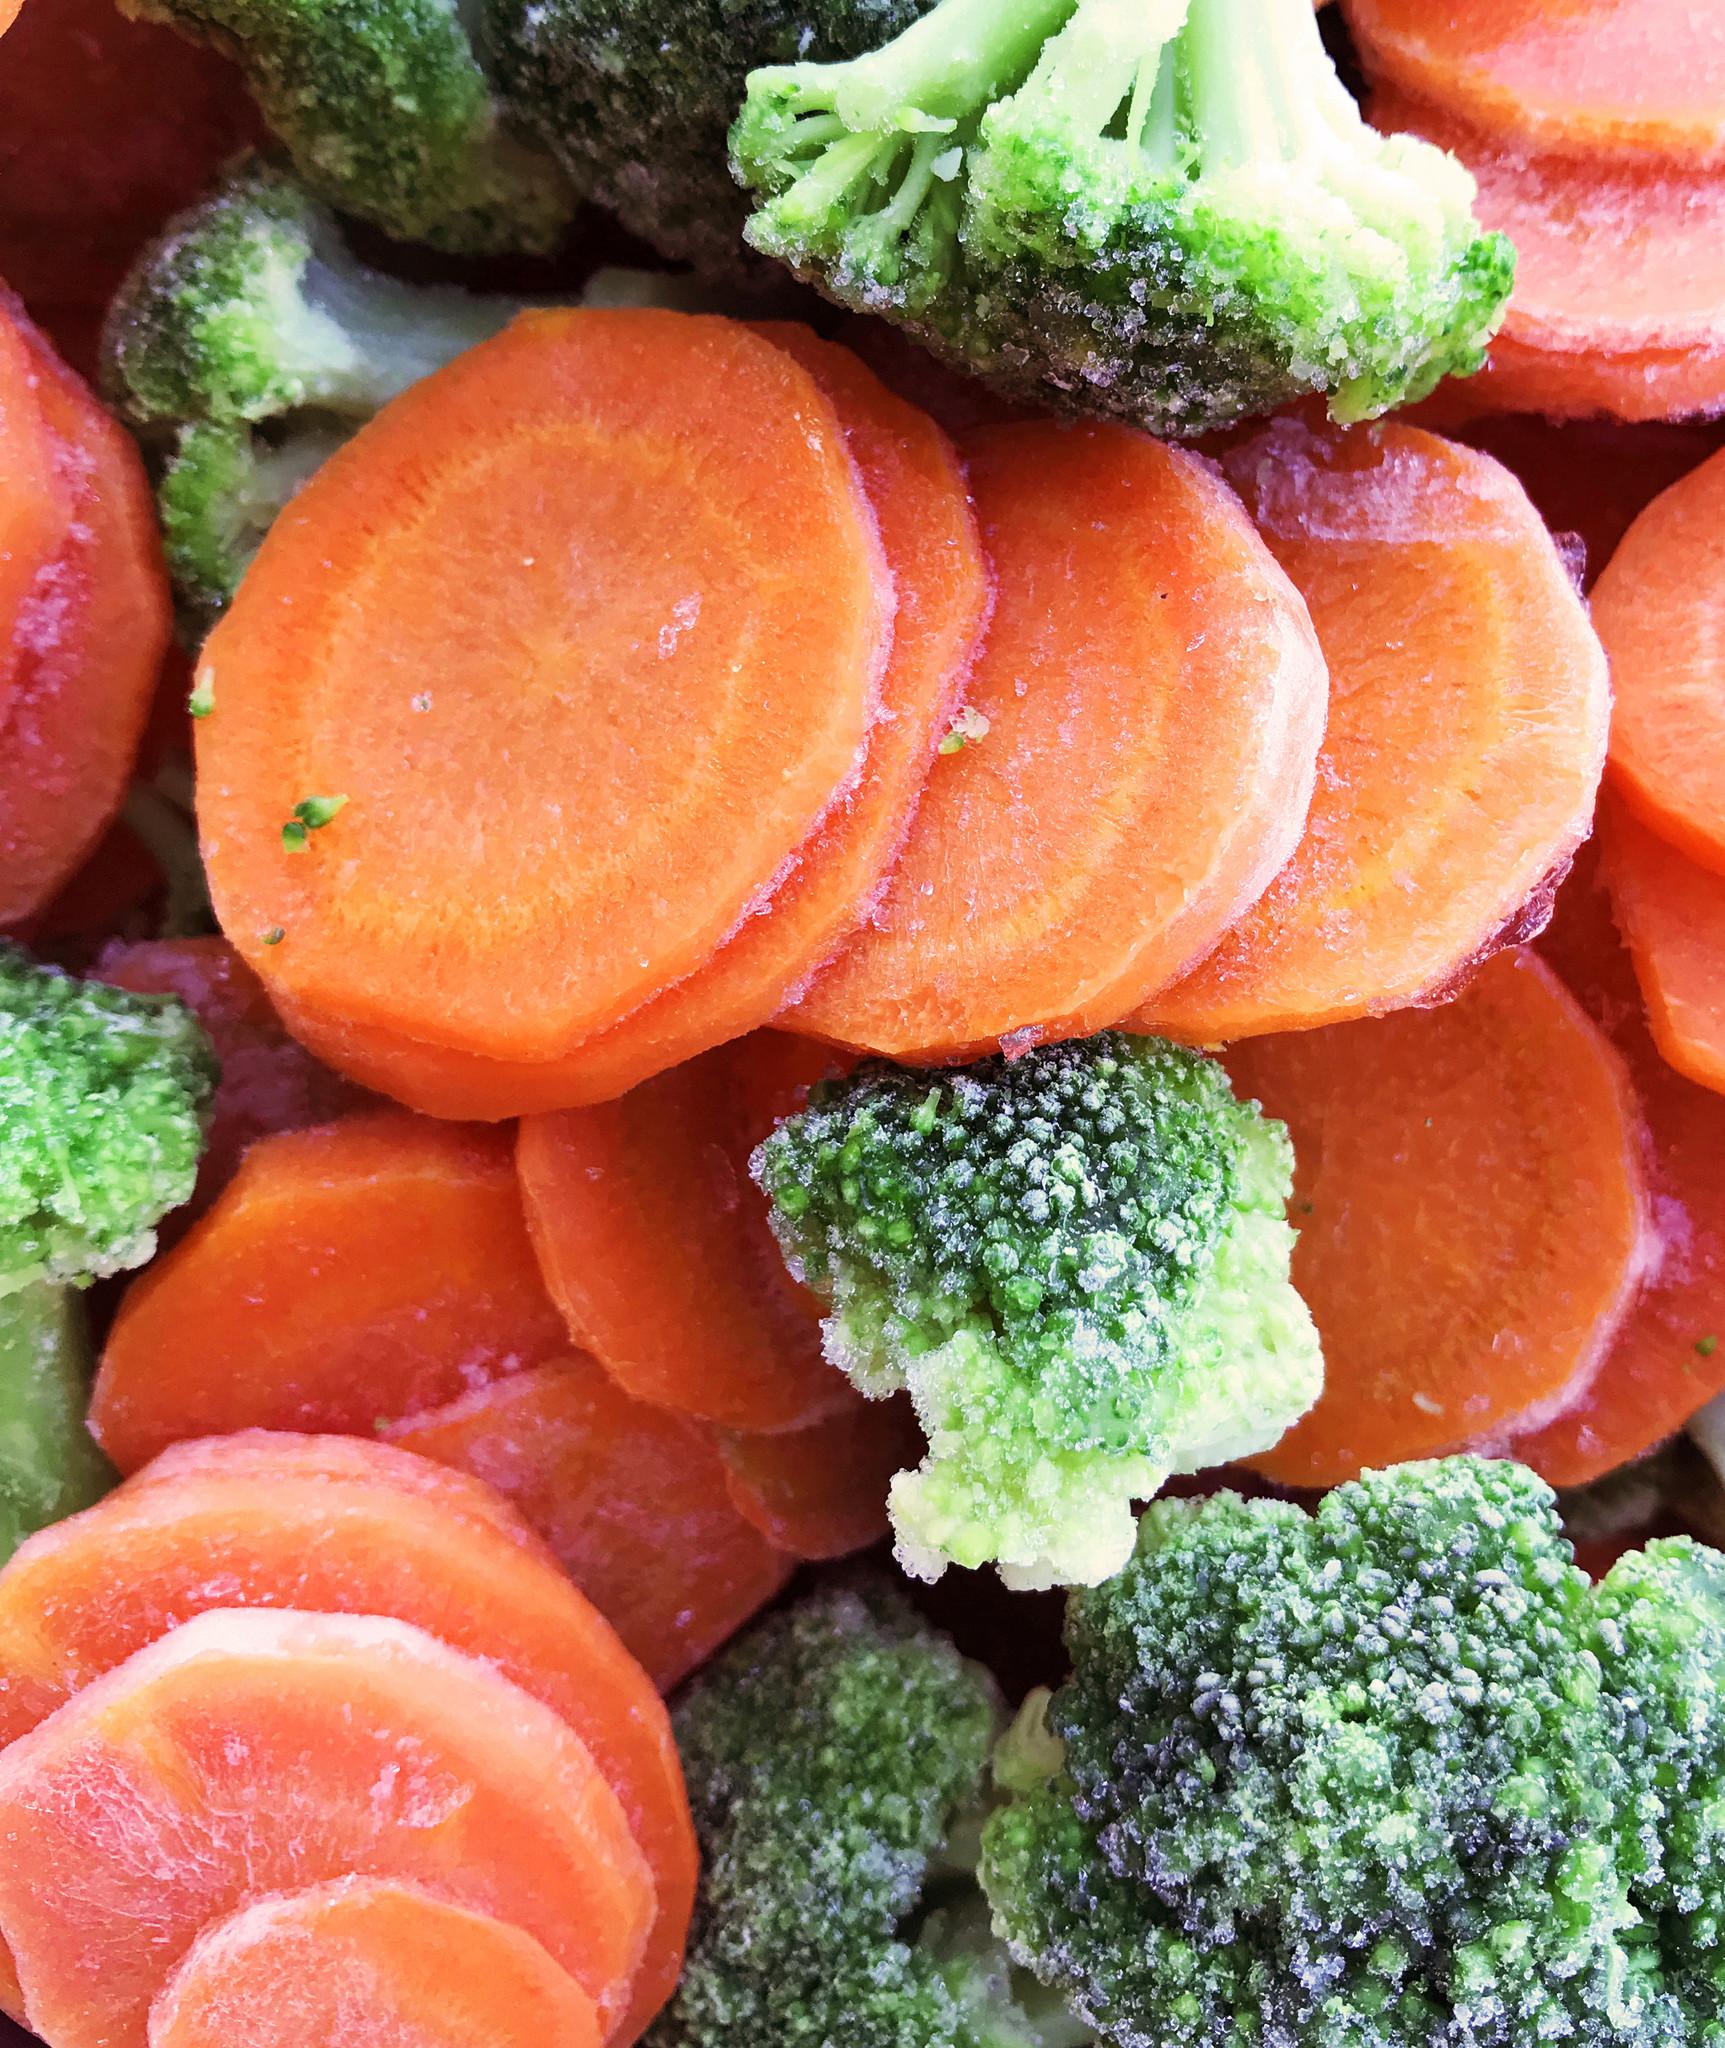 Broccoli and carrots